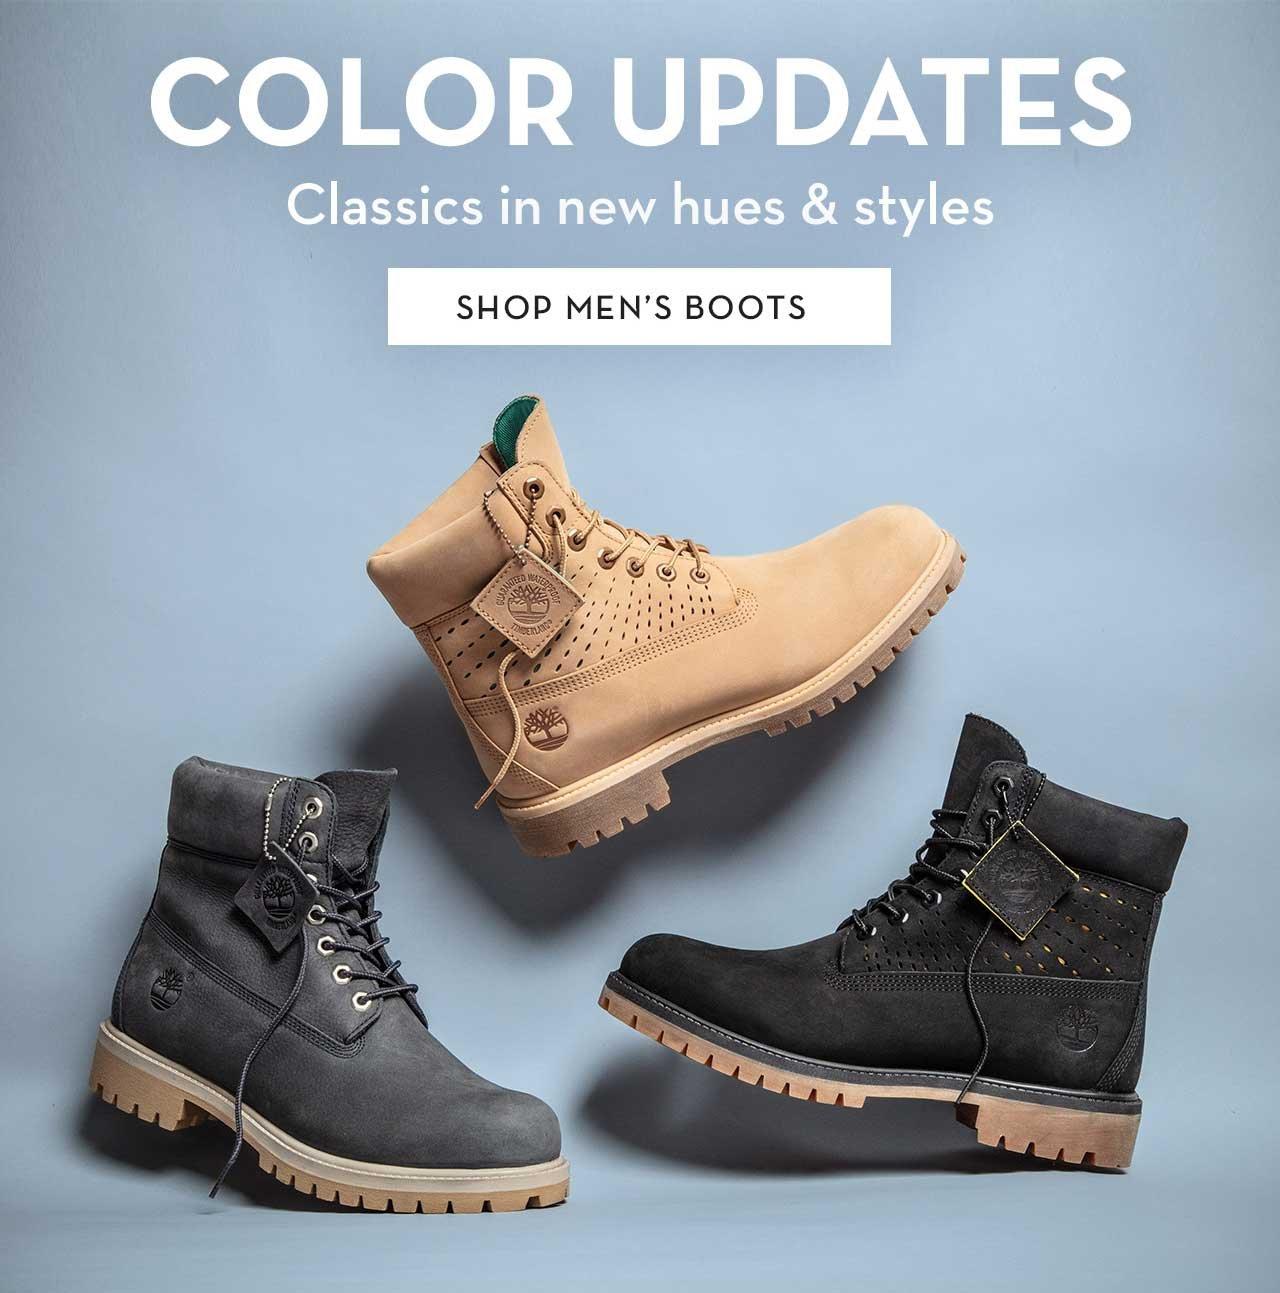 Color Updates Classics in new hues & styles Shop Men's Boots